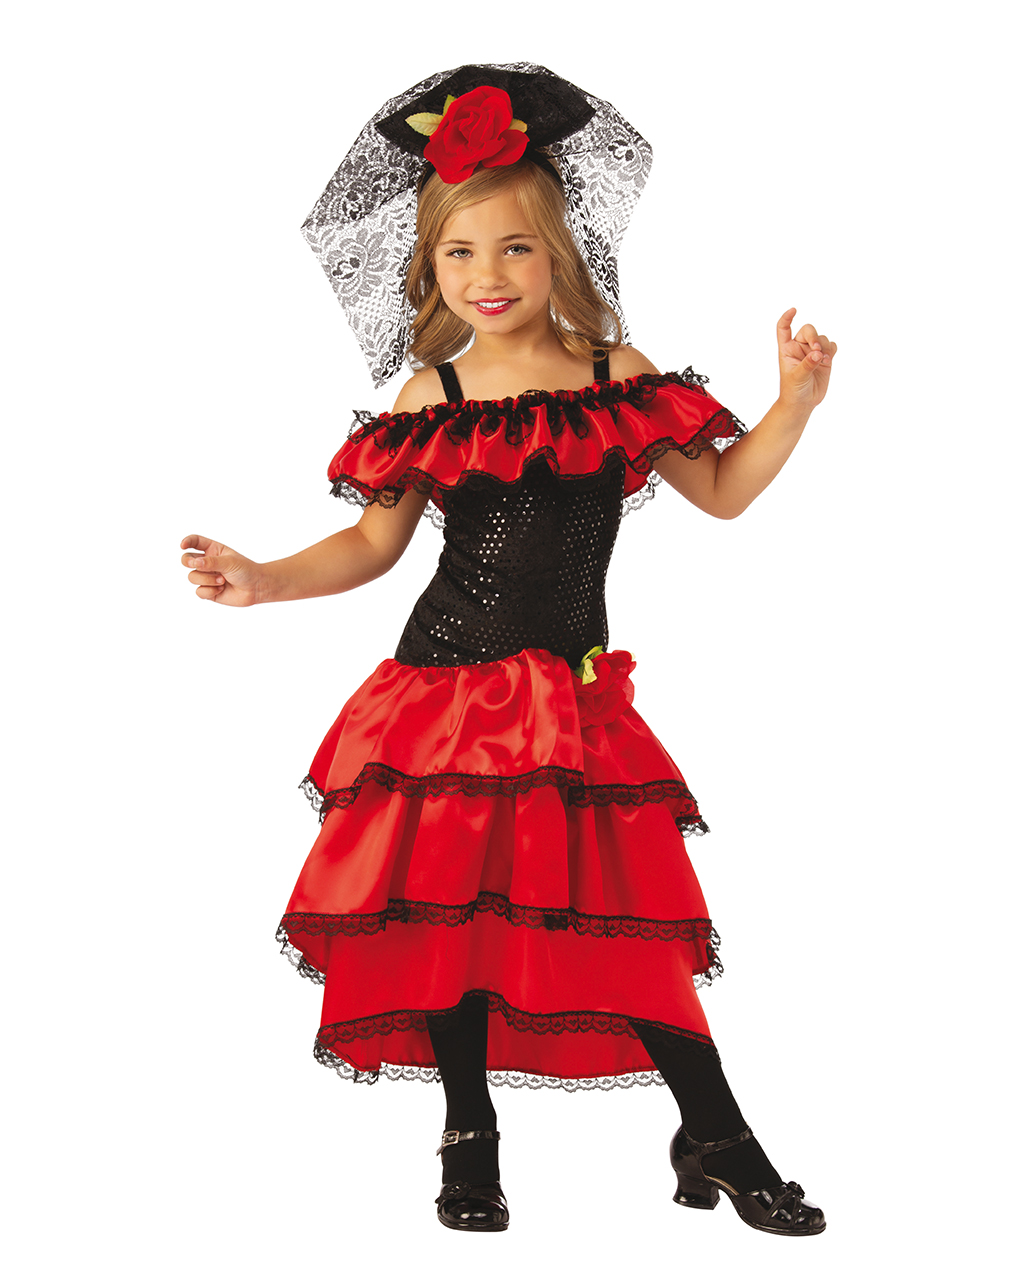 Costume Carneval Theme Party Spanish Lady Flamenco L